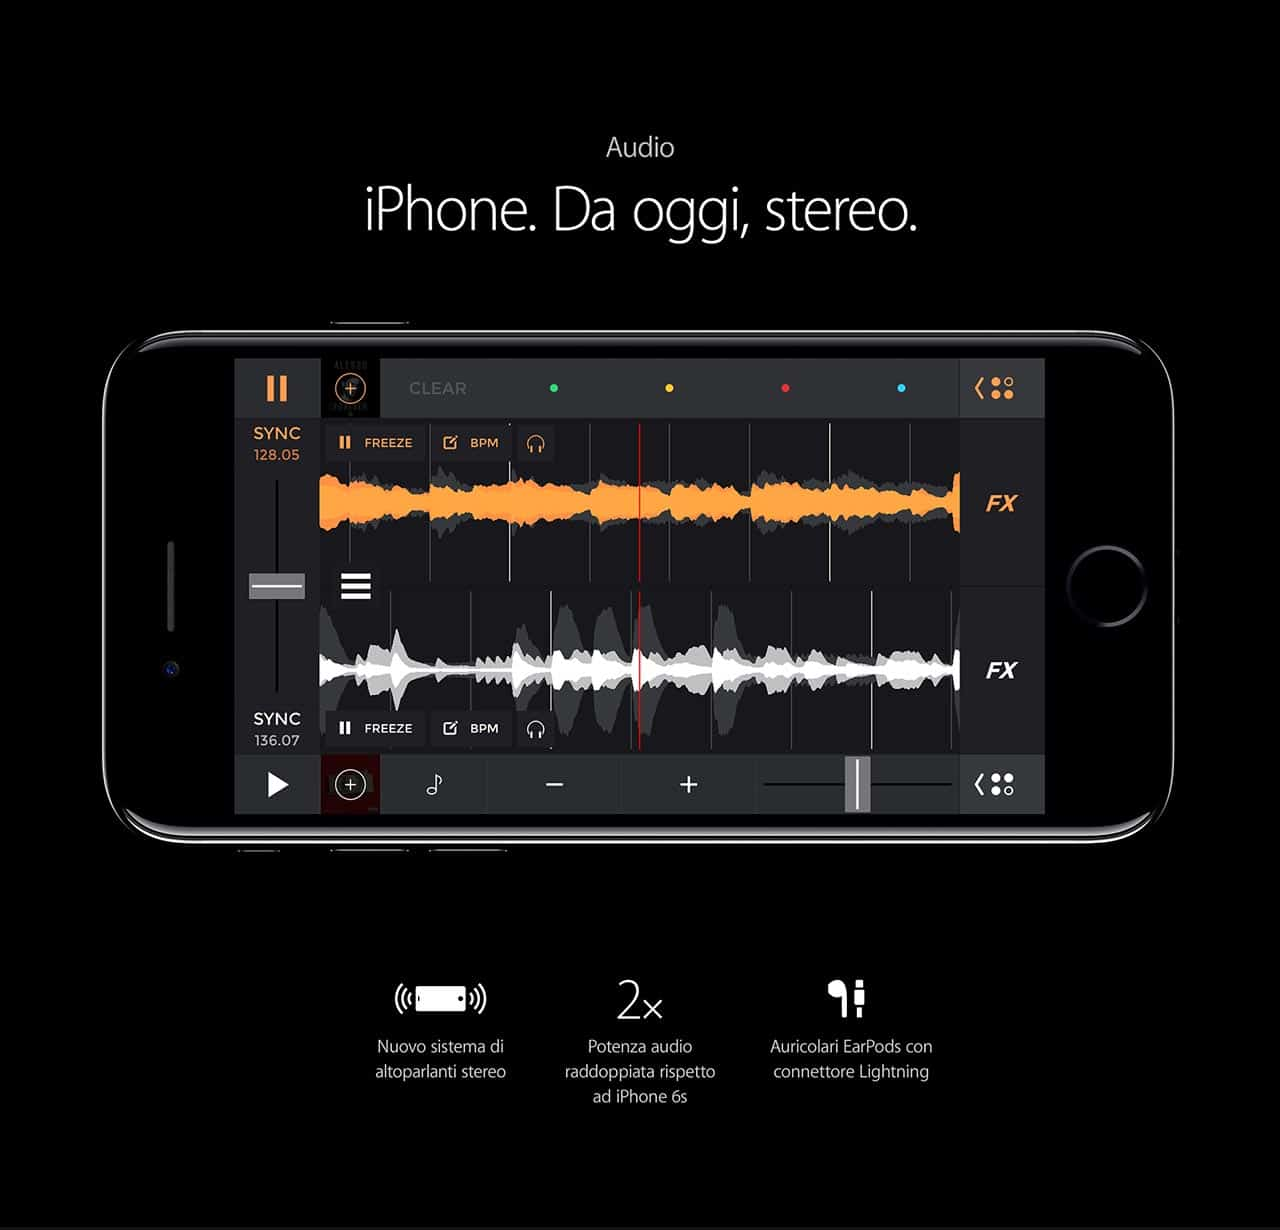 iPhone 7 caratteristiche Audio